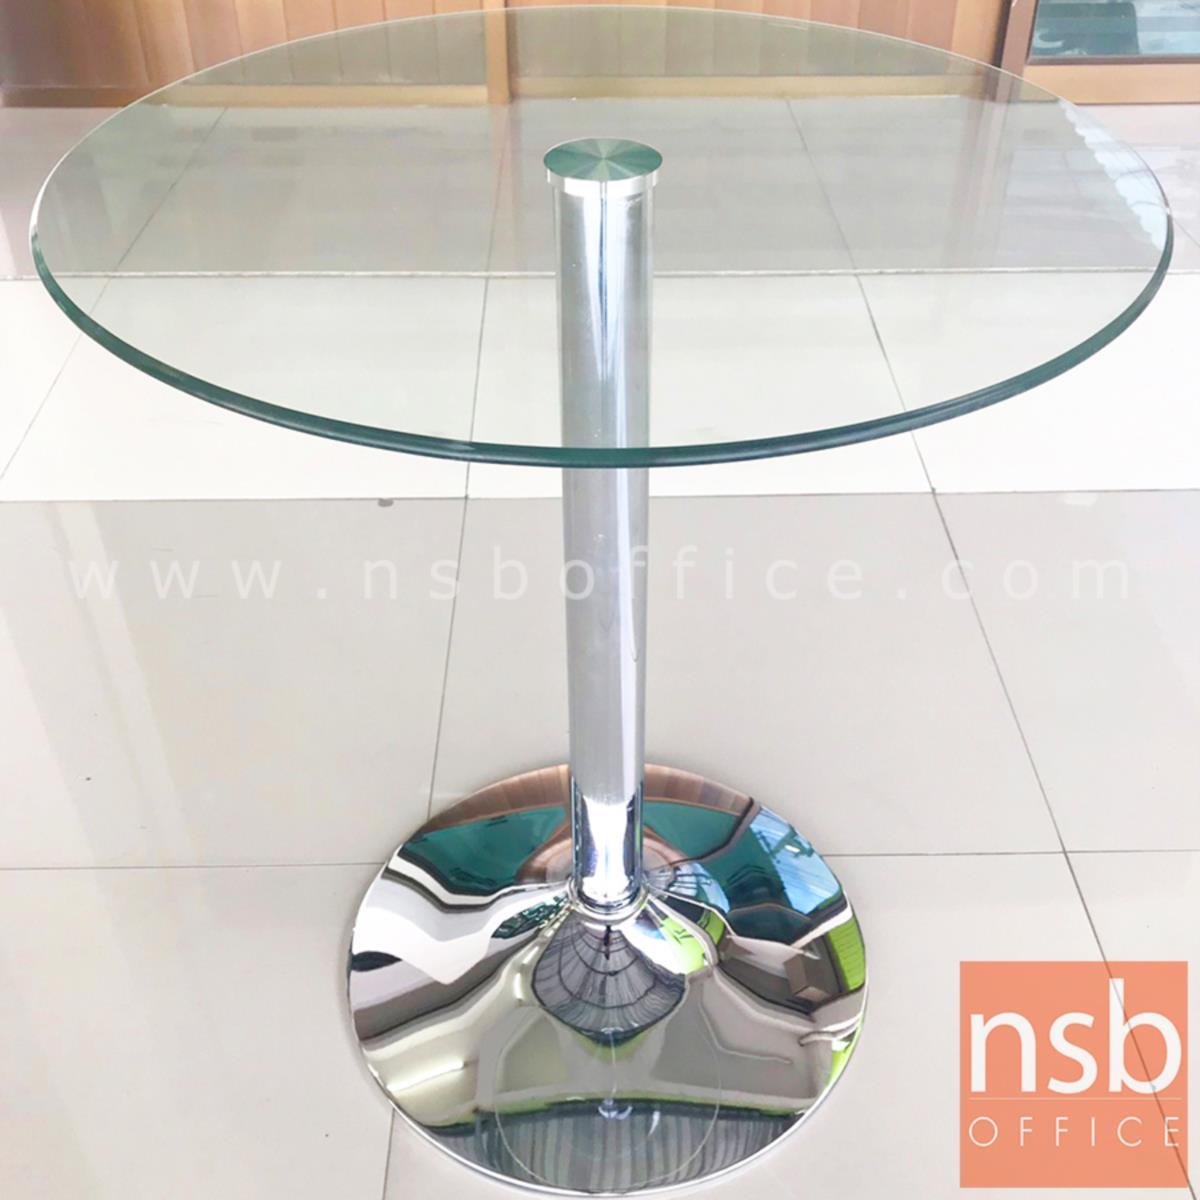 A09A047:โต๊ะกลมหน้ากระจก รุ่น Honey (ฮันนี) ขนาด 60Di ,80Di cm.  โครงขาเหล็กชุบโครเมี่ยม